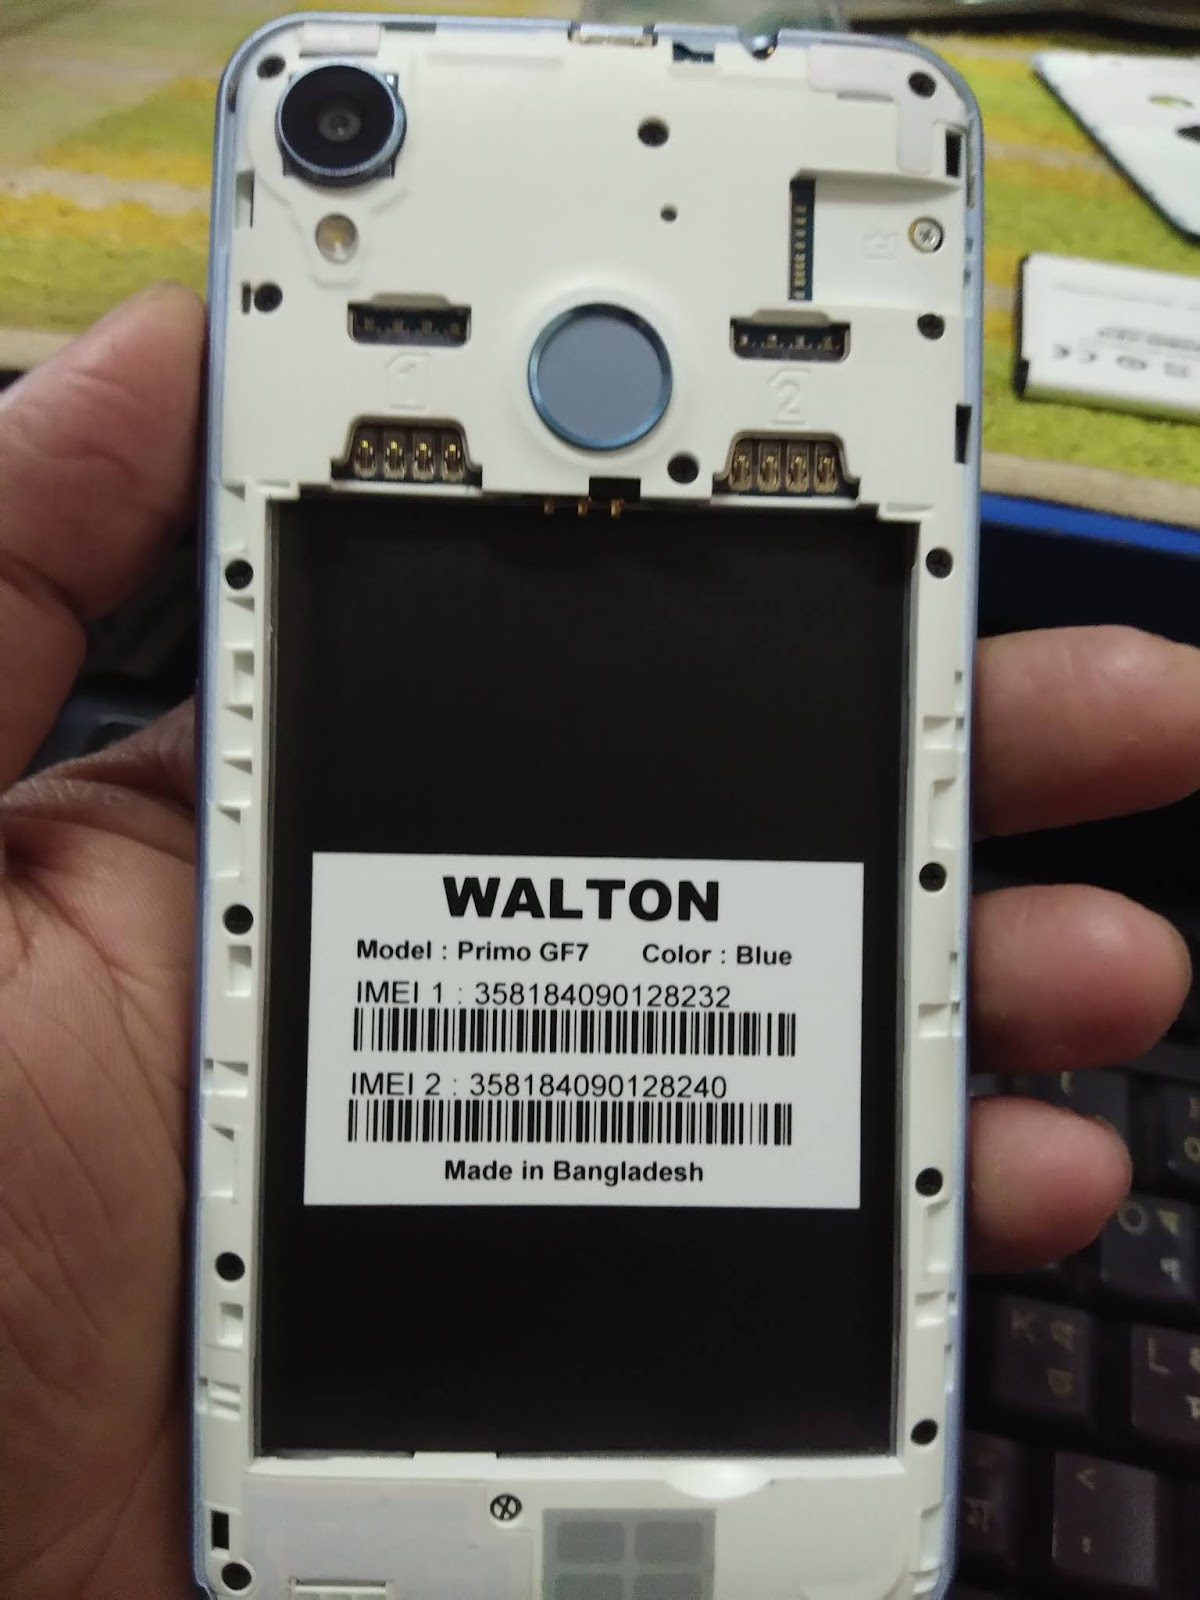 Walton Primo GF7 Frp Bypass